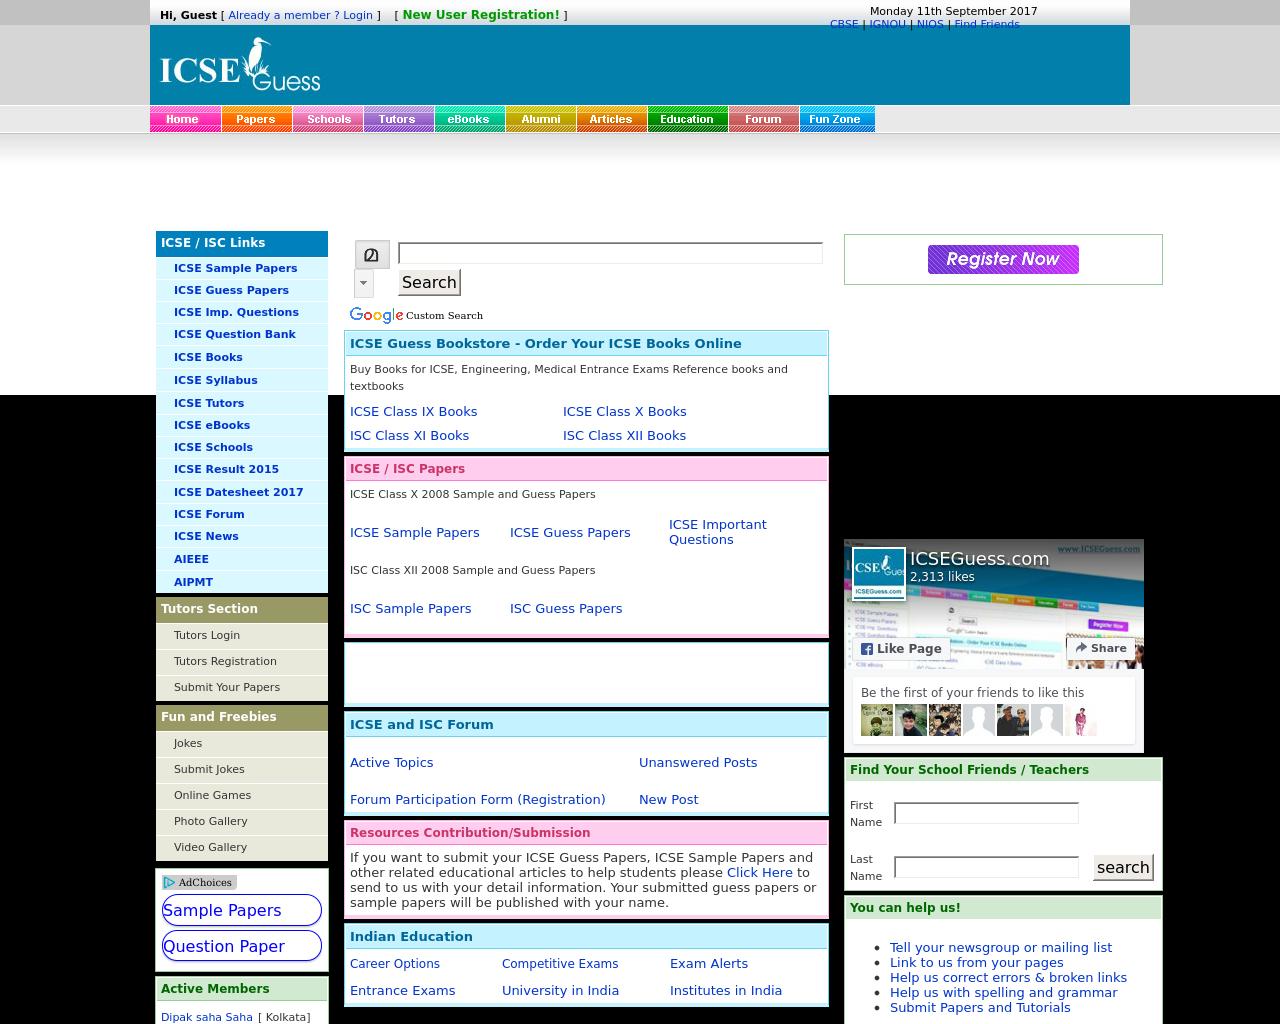 ICSEGuess-Advertising-Reviews-Pricing